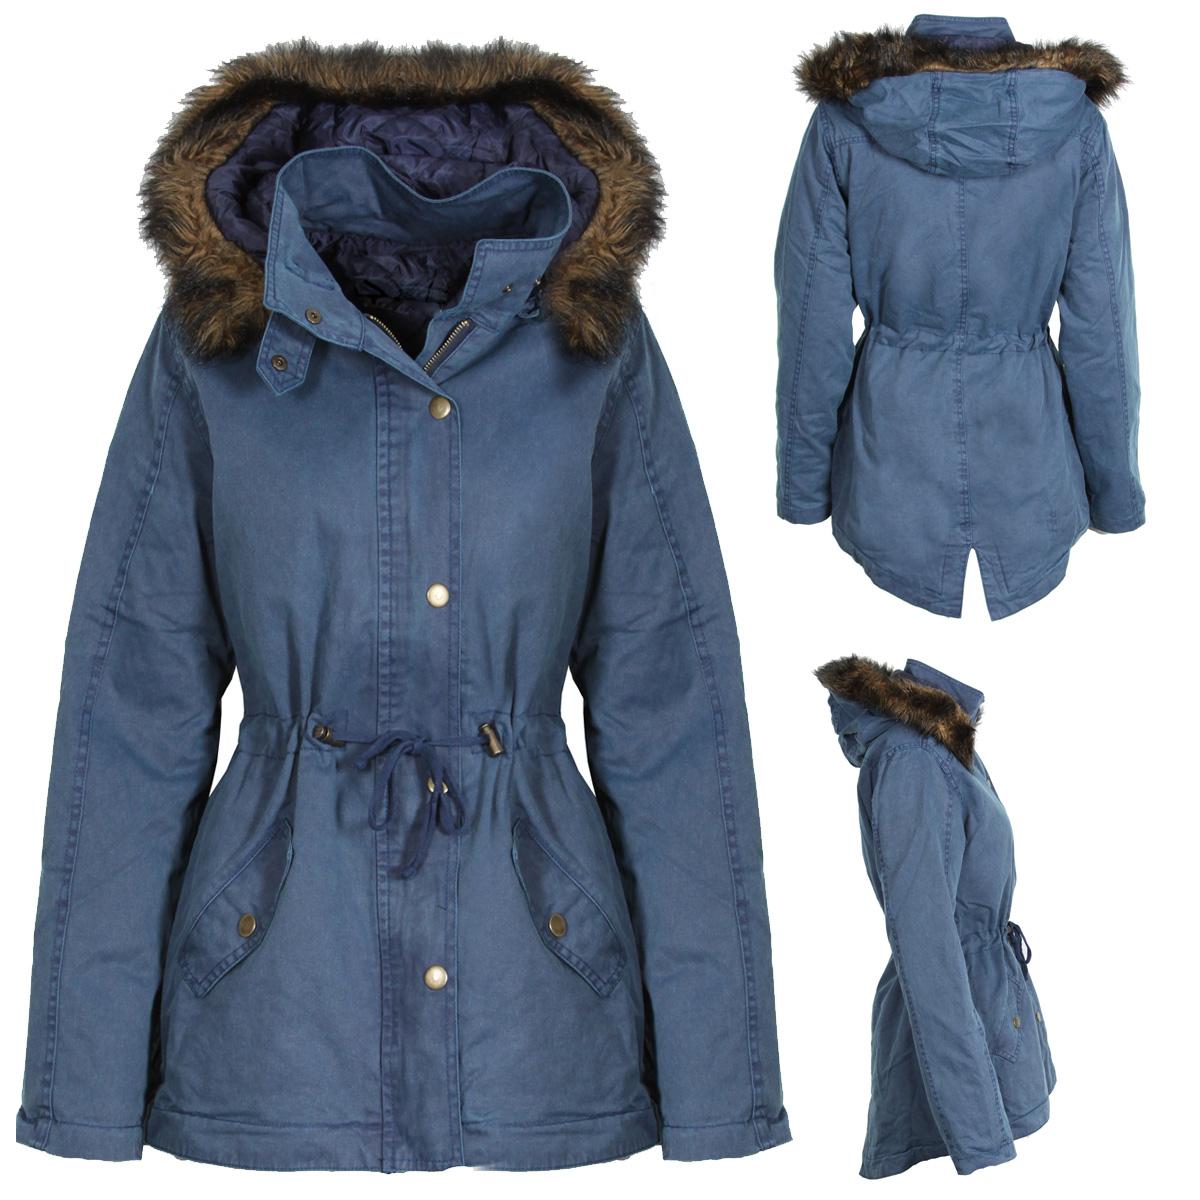 new womens blue parka winter coat jacket warm fur trim. Black Bedroom Furniture Sets. Home Design Ideas